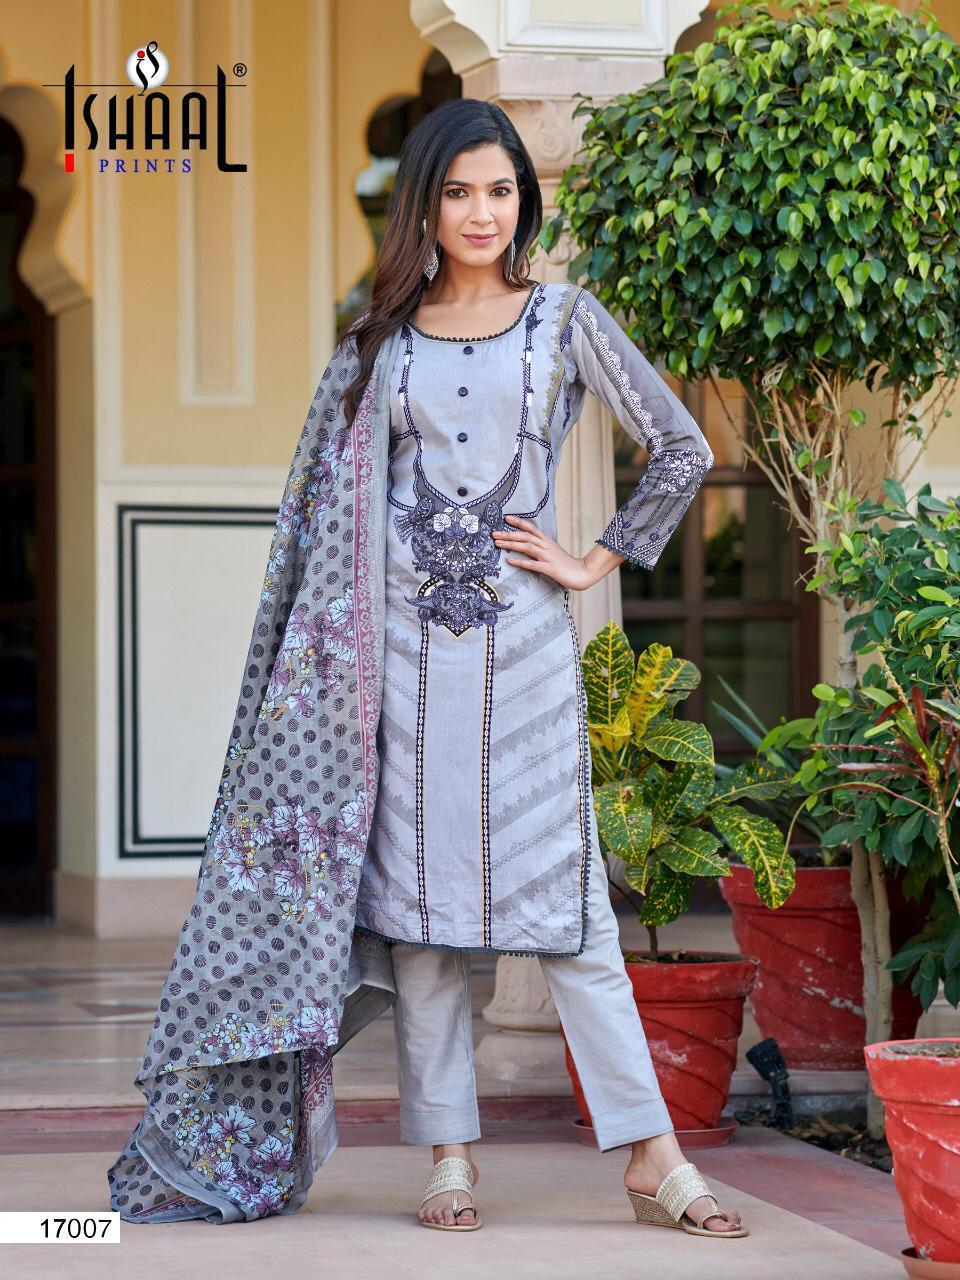 Ishaal Gulmohar Vol 17 Salwar Suit Wholesale Catalog 10 Pcs 16 - Ishaal Gulmohar Vol 17 Salwar Suit Wholesale Catalog 10 Pcs